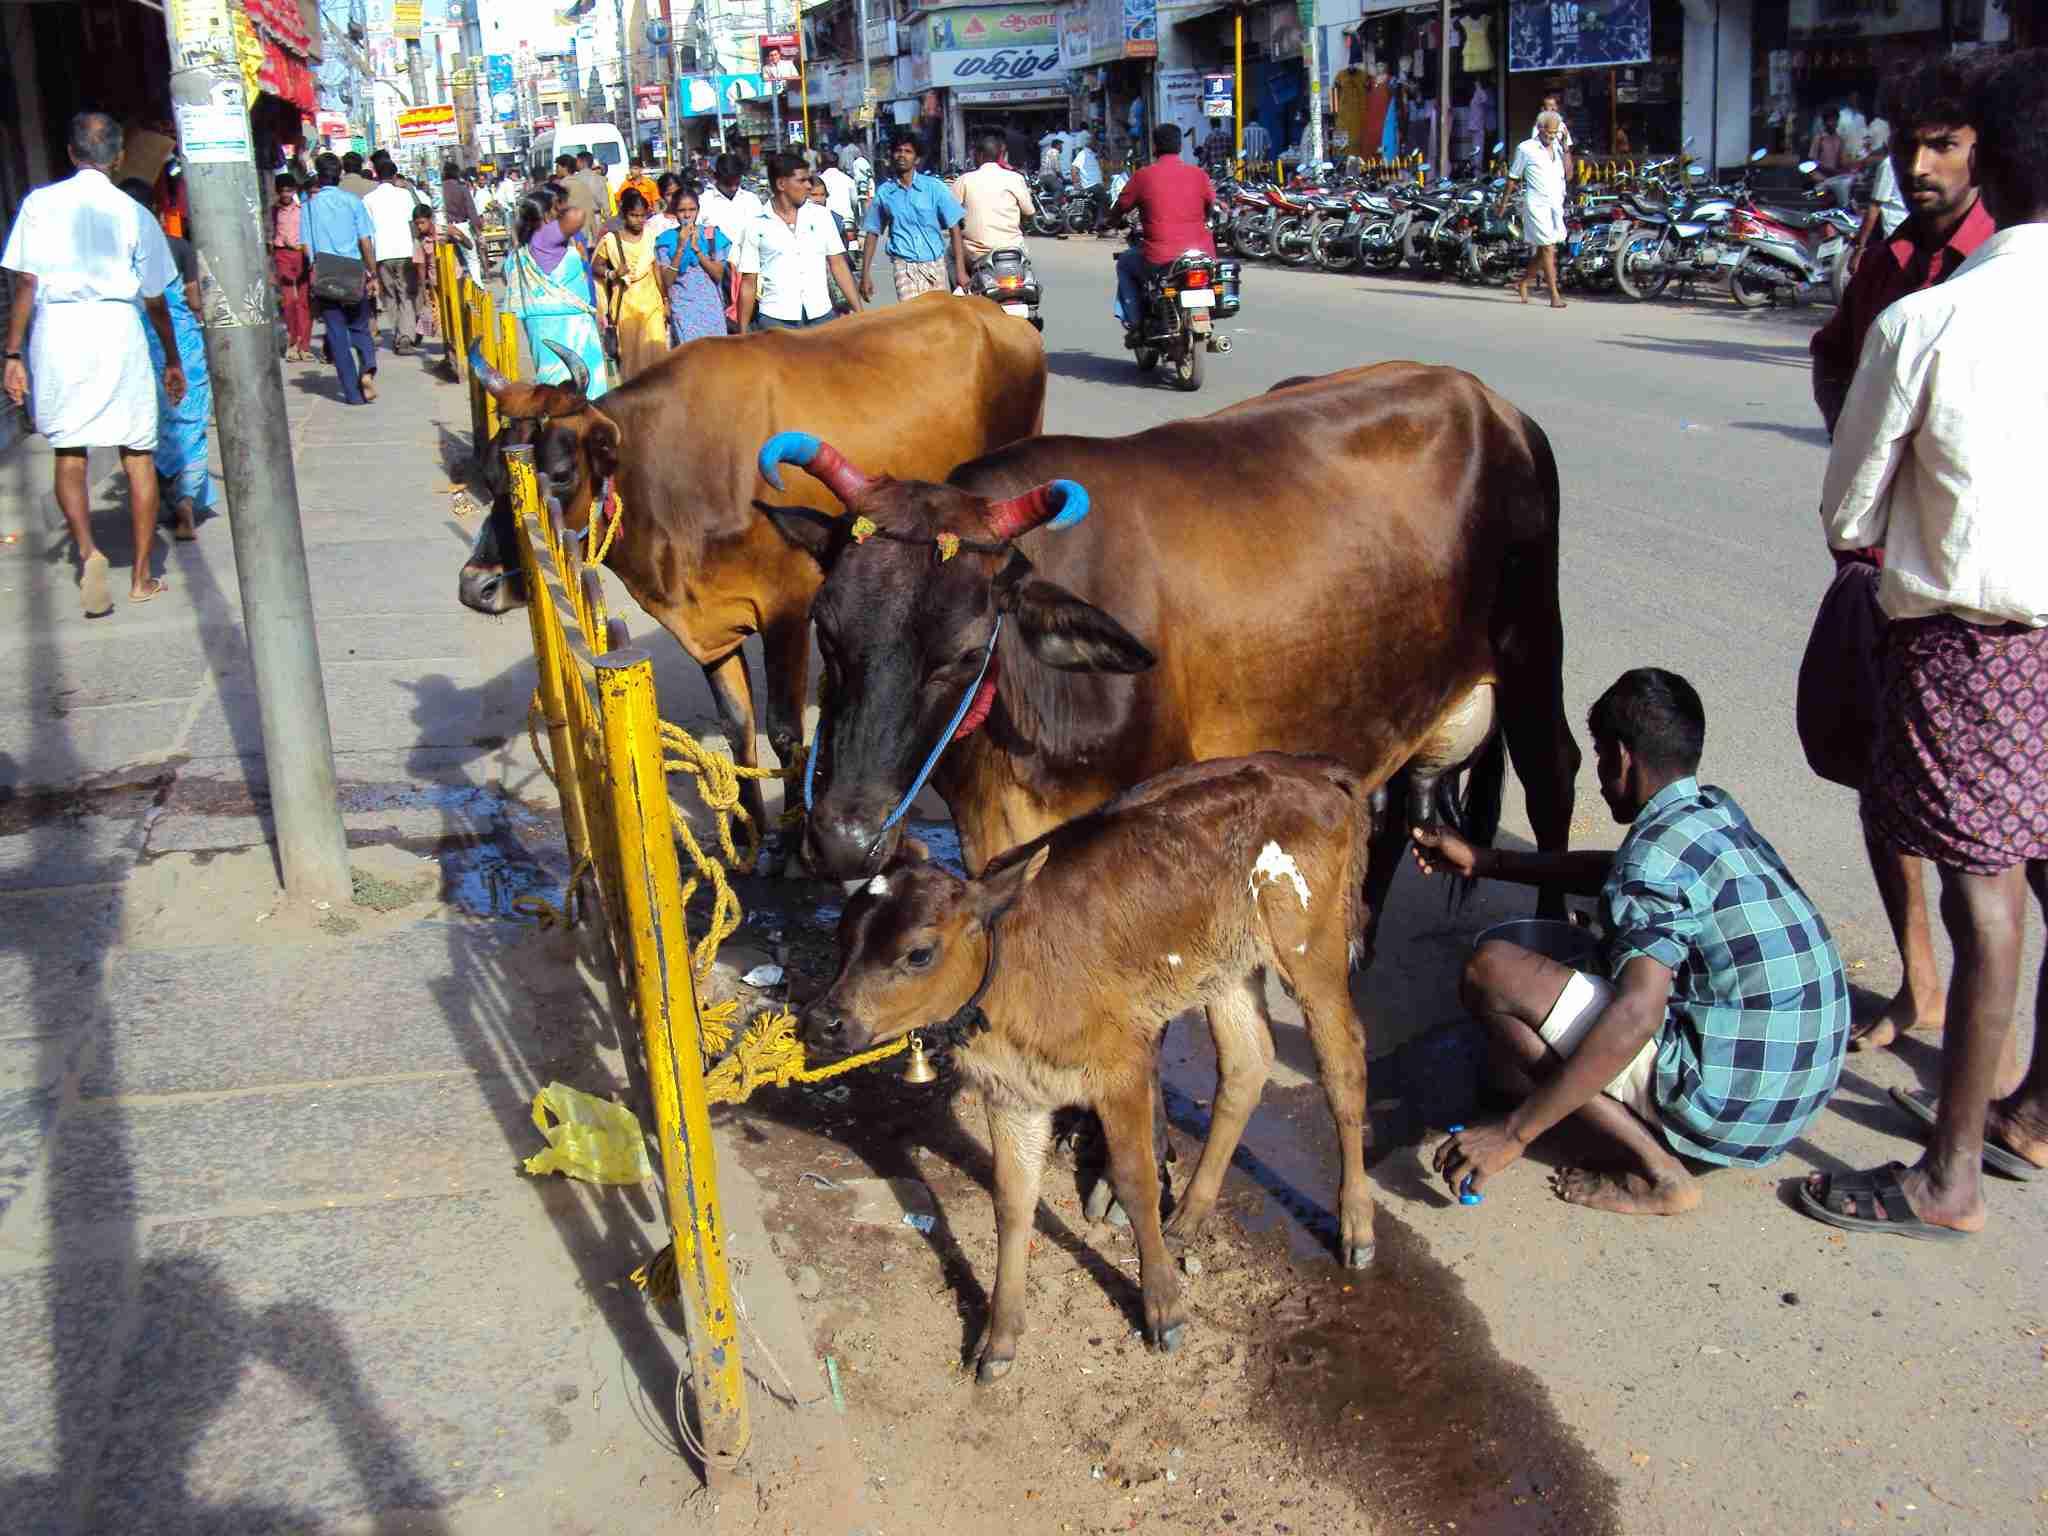 Madurai street scenes